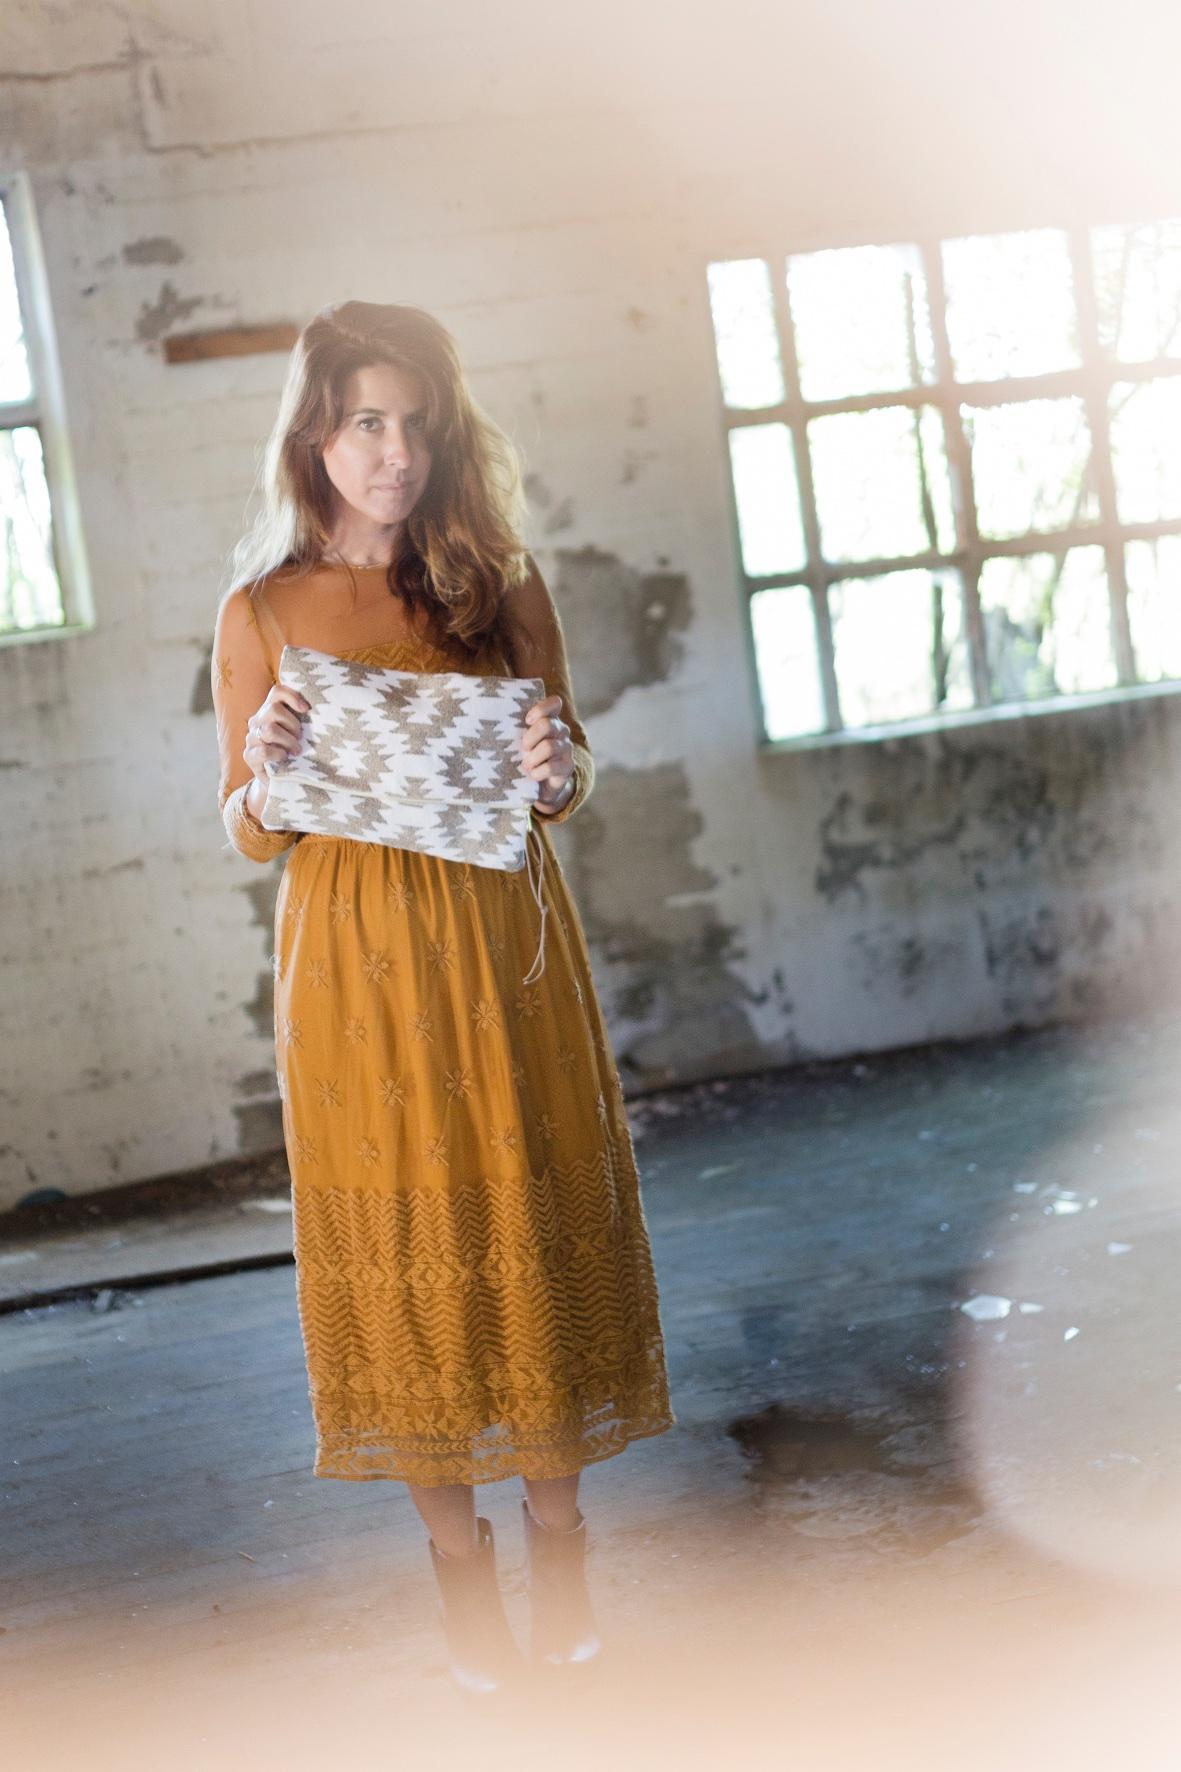 stylelovely-zara dress- vestido mostaza - descalzaporelparque - zara - style - blogger - fashion-lo en las nubes - clutch